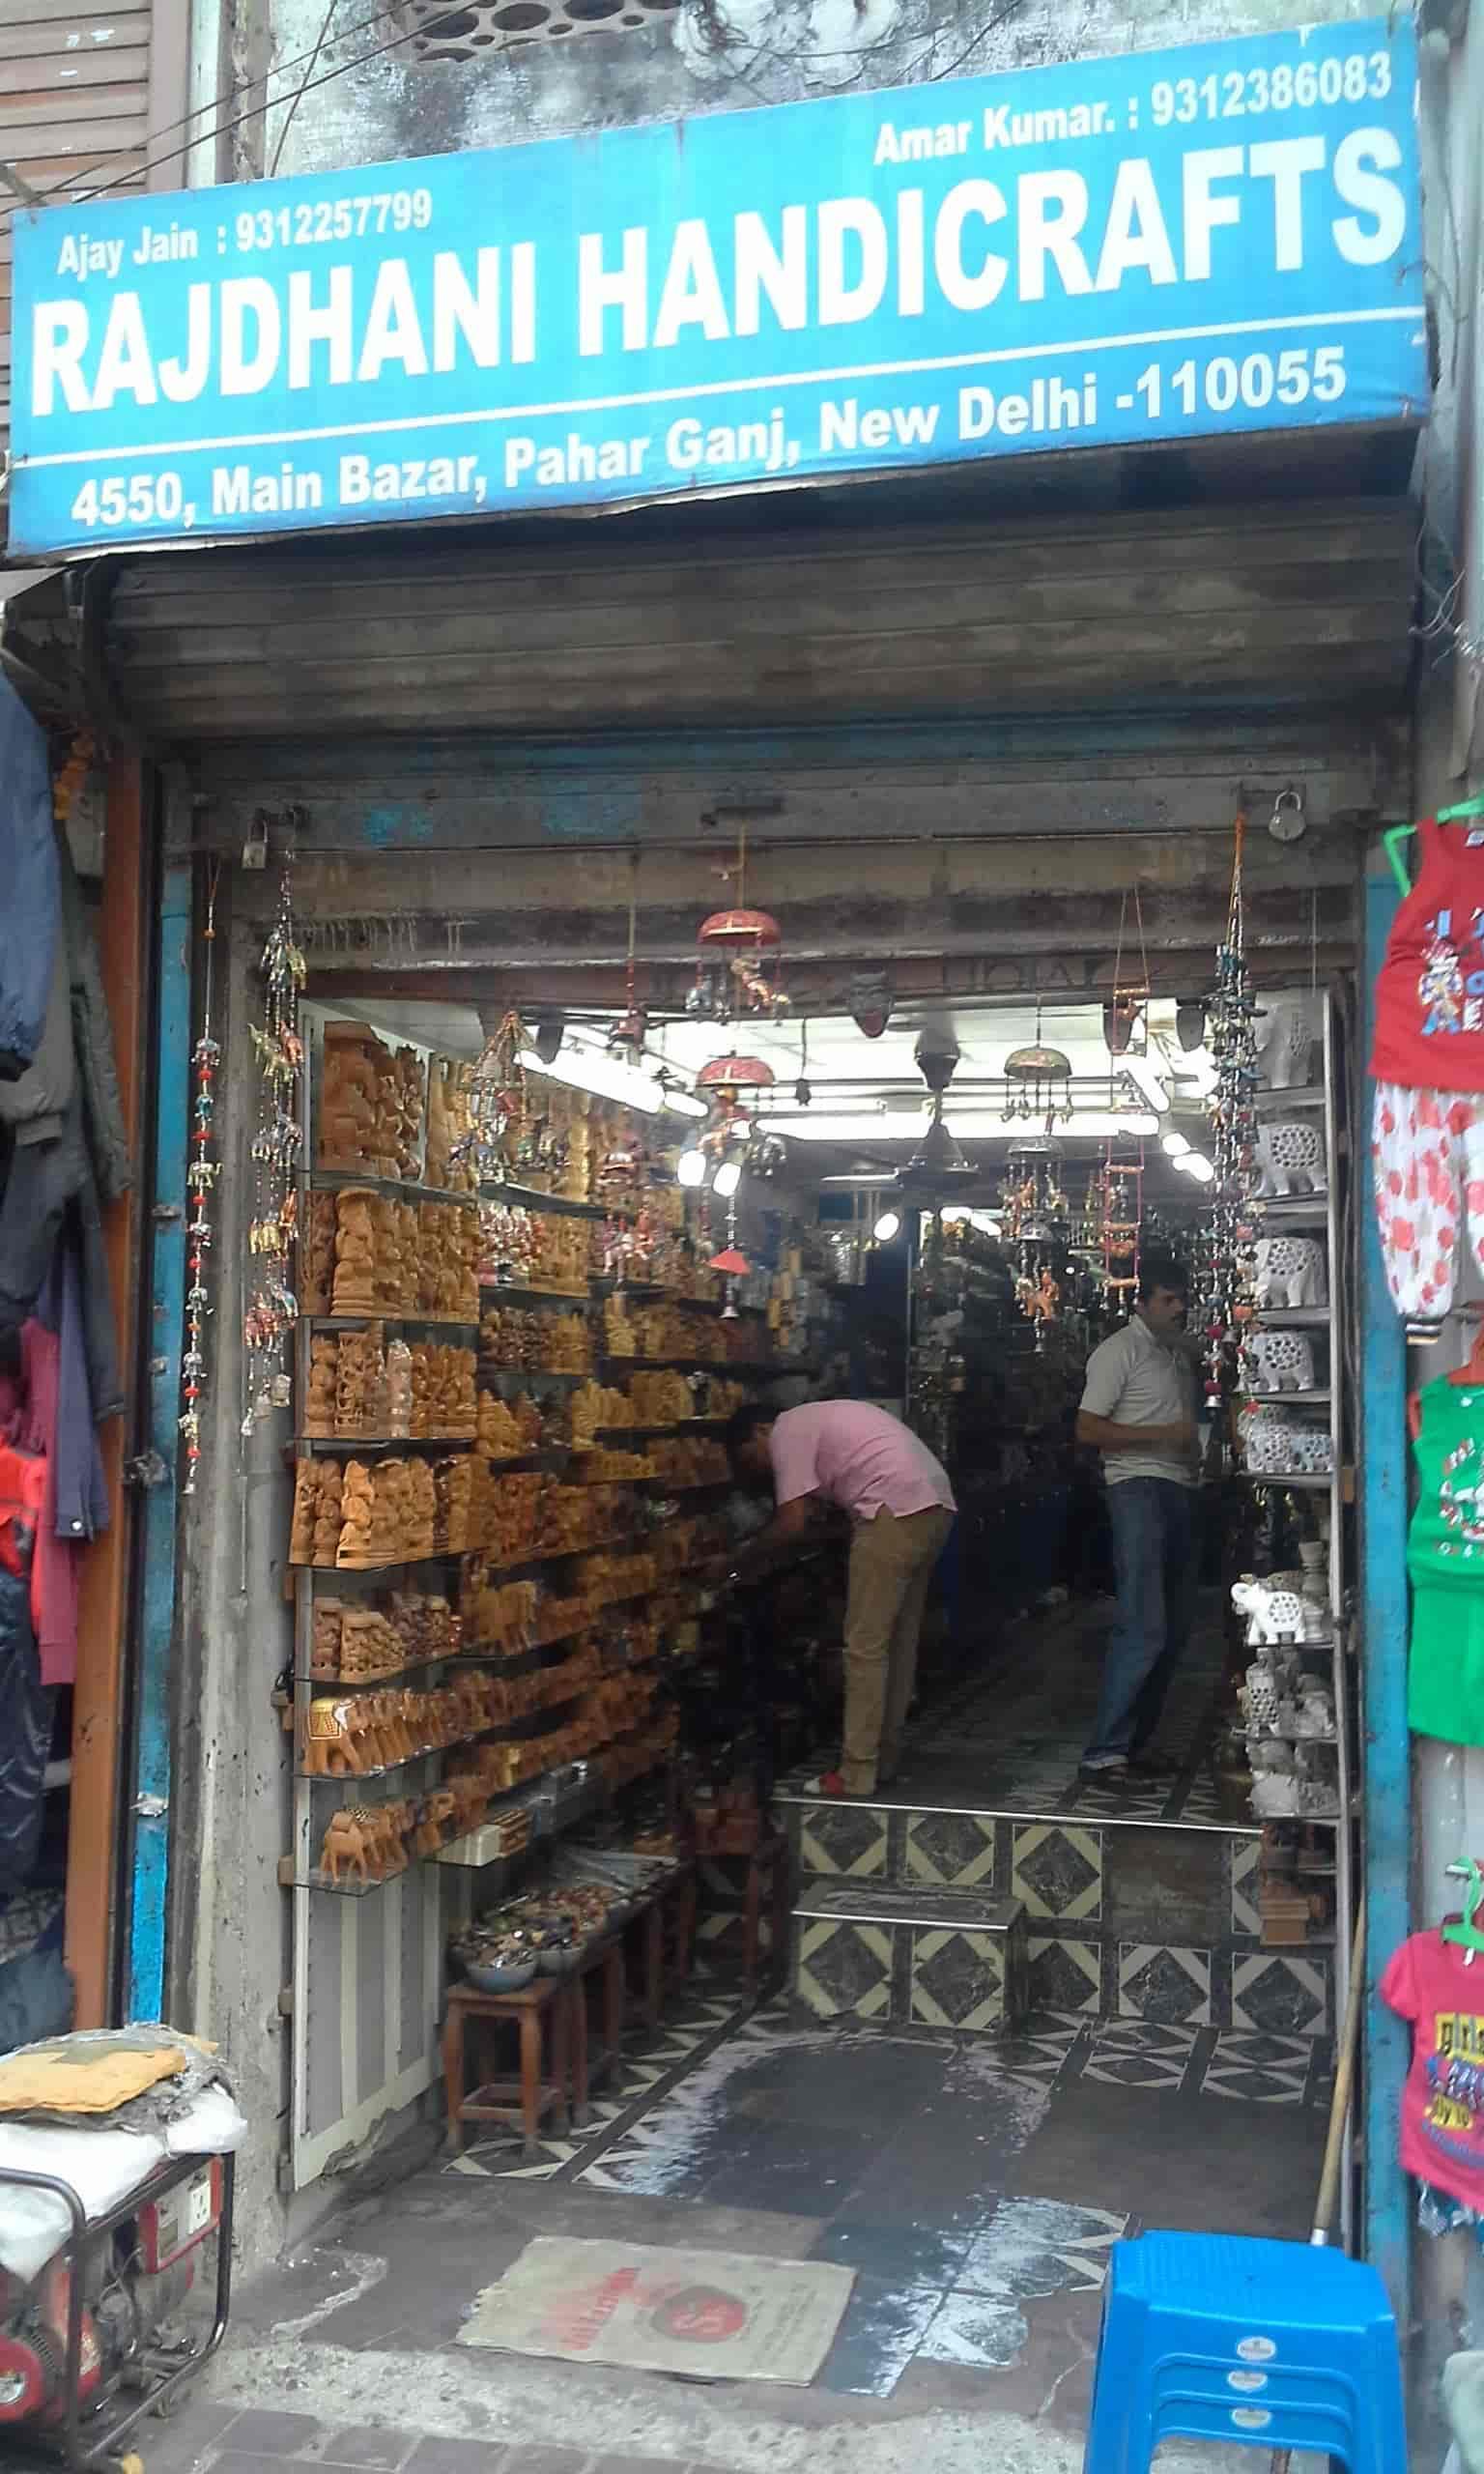 Rajdhani Handicrafts Photos Pahar Ganj Delhi Pictures Images